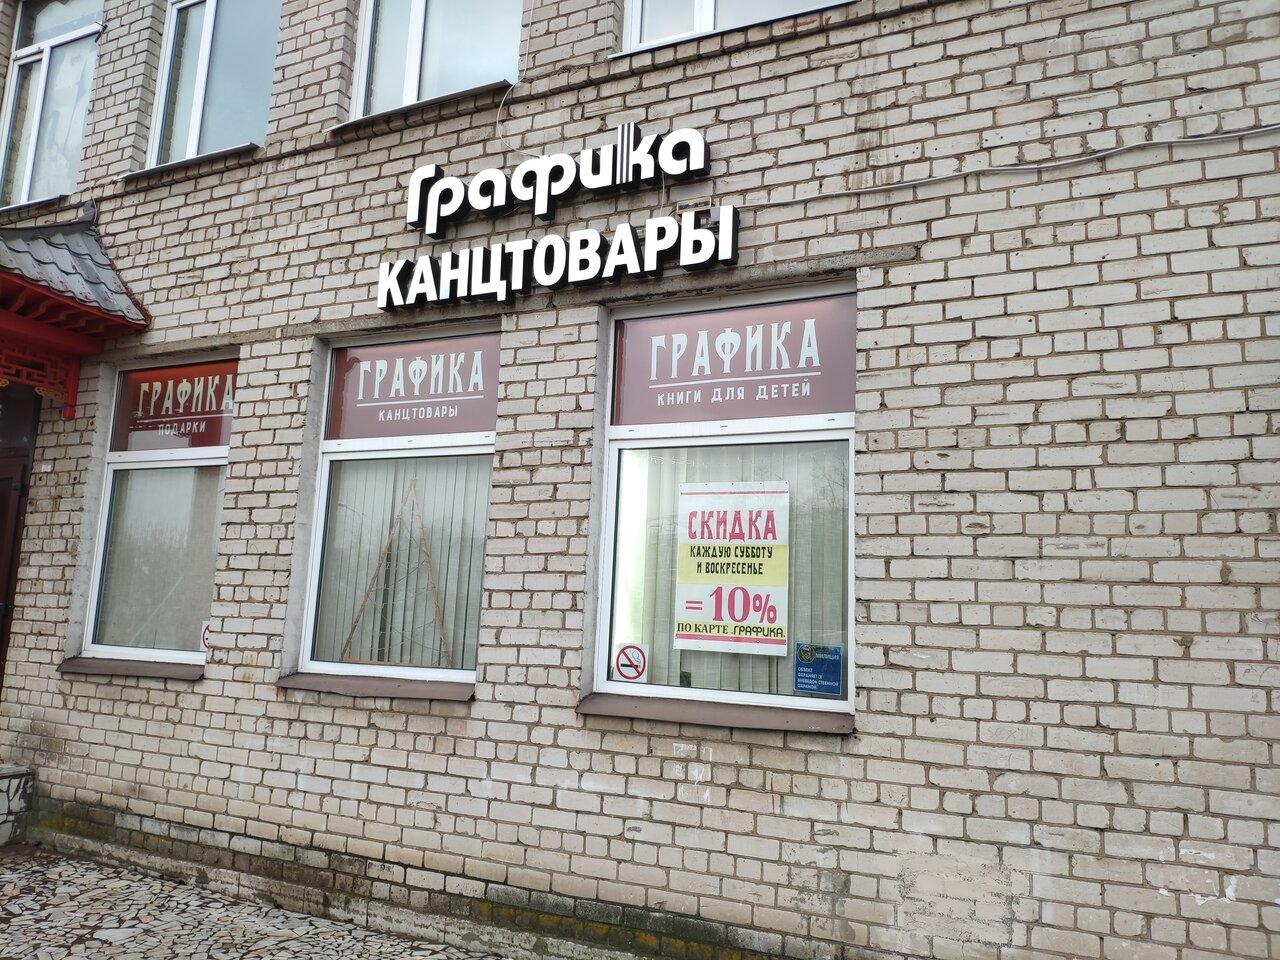 Графика Магазин Спб